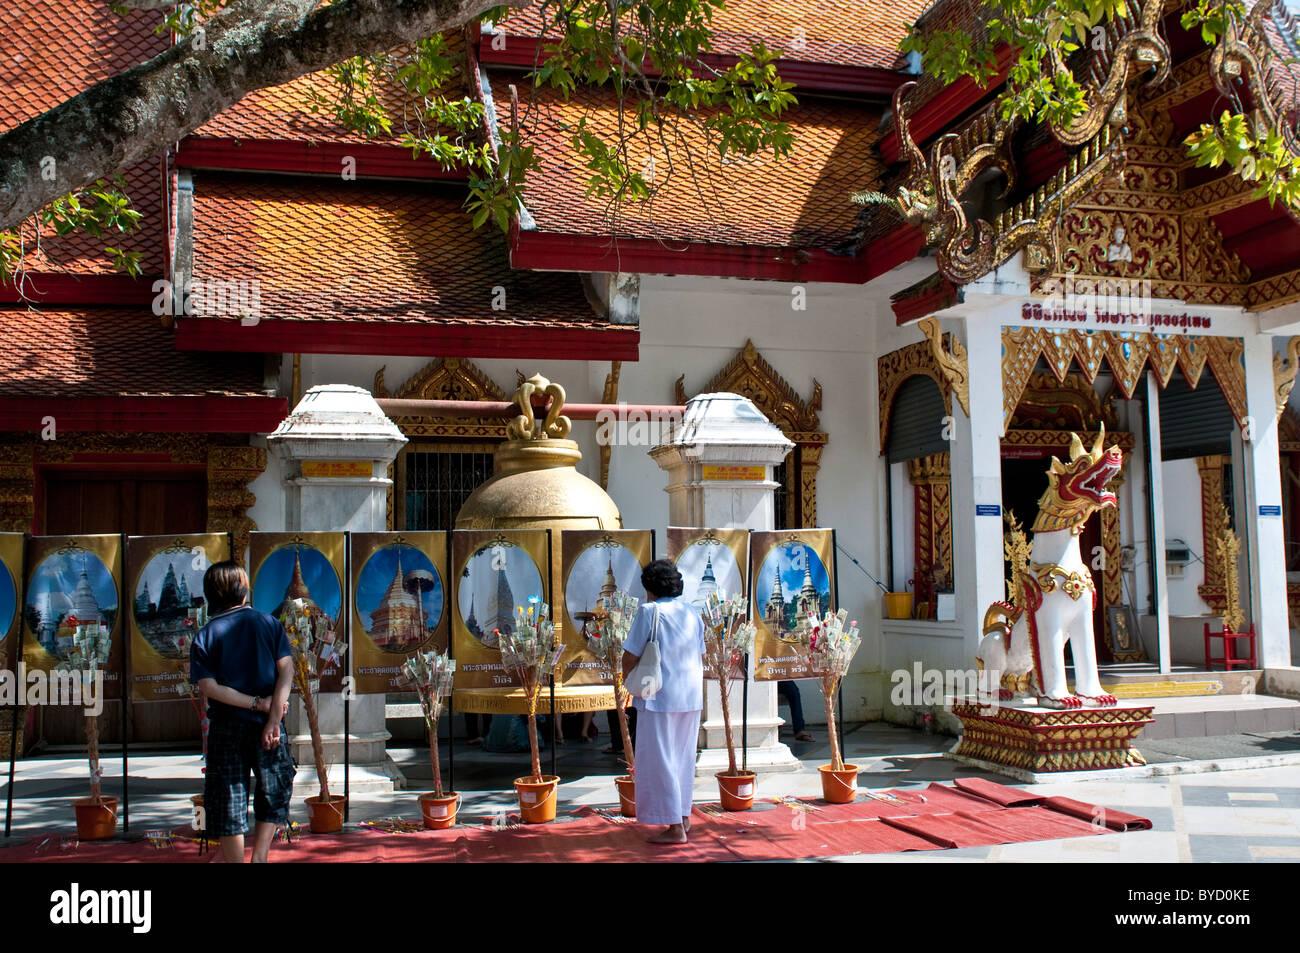 Worshiper giving money offerings, Wat Phra That Doi Suthep, Chiang Mai, Thailand - Stock Image